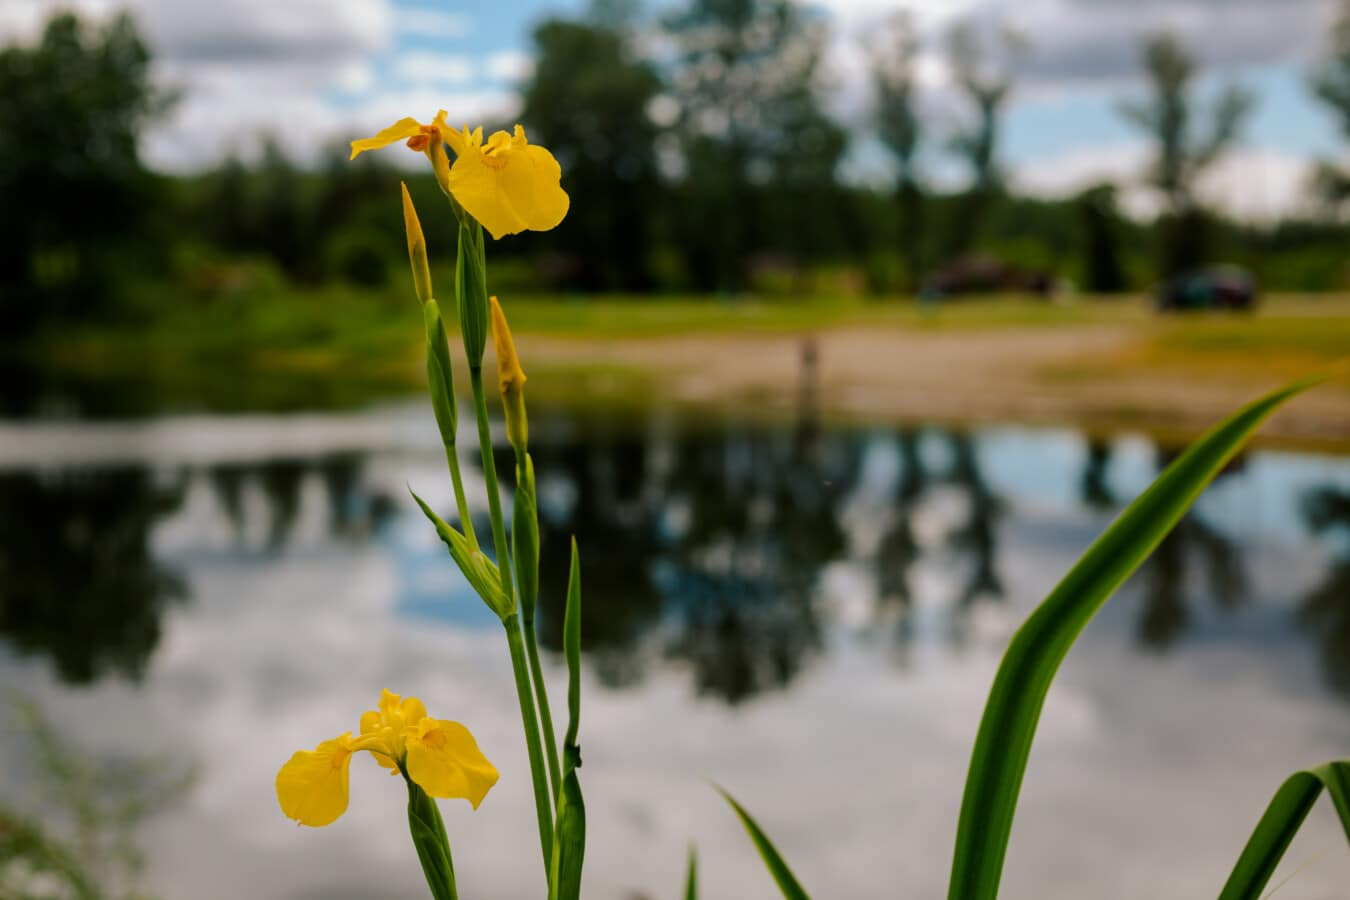 yellow leaves, yellowish, wildflower, lakeside, spring, flowers, nature, garden, plant, flower